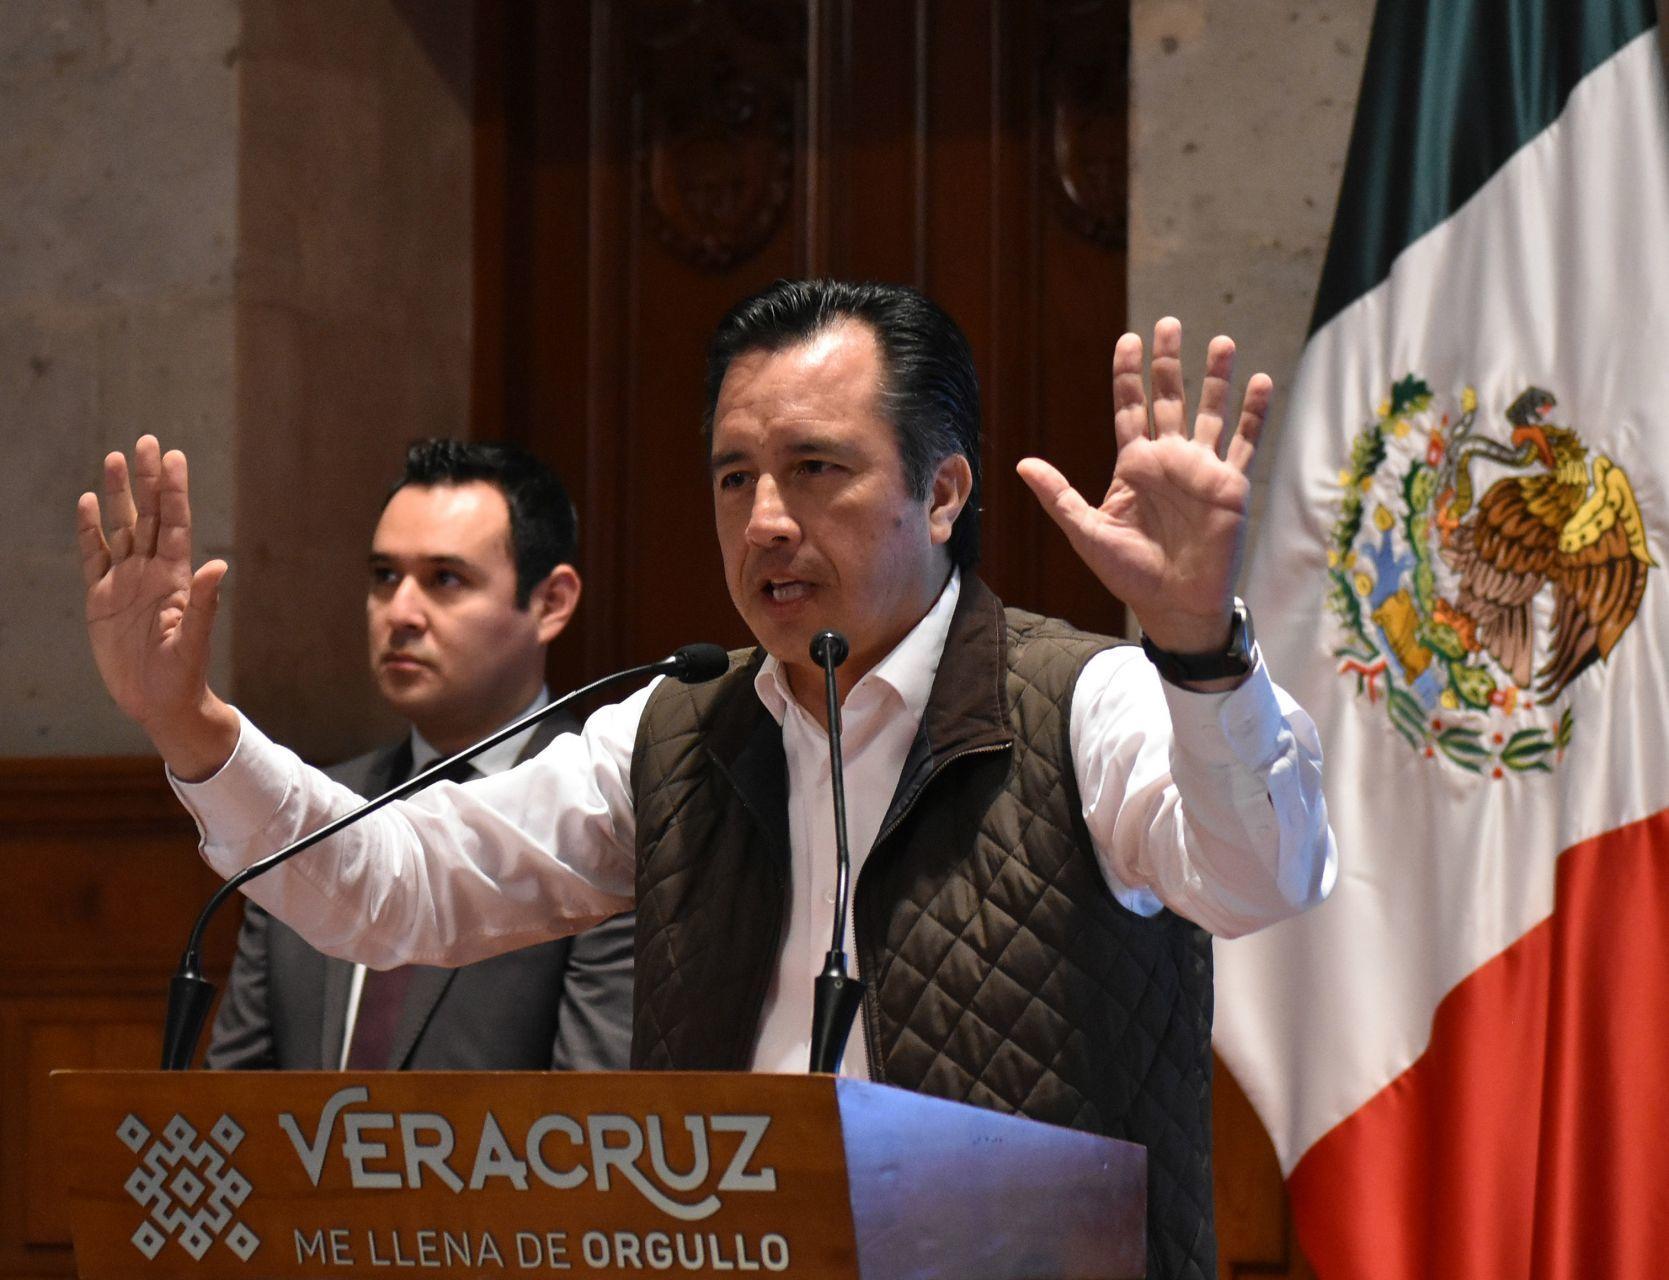 VIDEO Comparan a gobernador de Veracruz con Andrea Legarreta